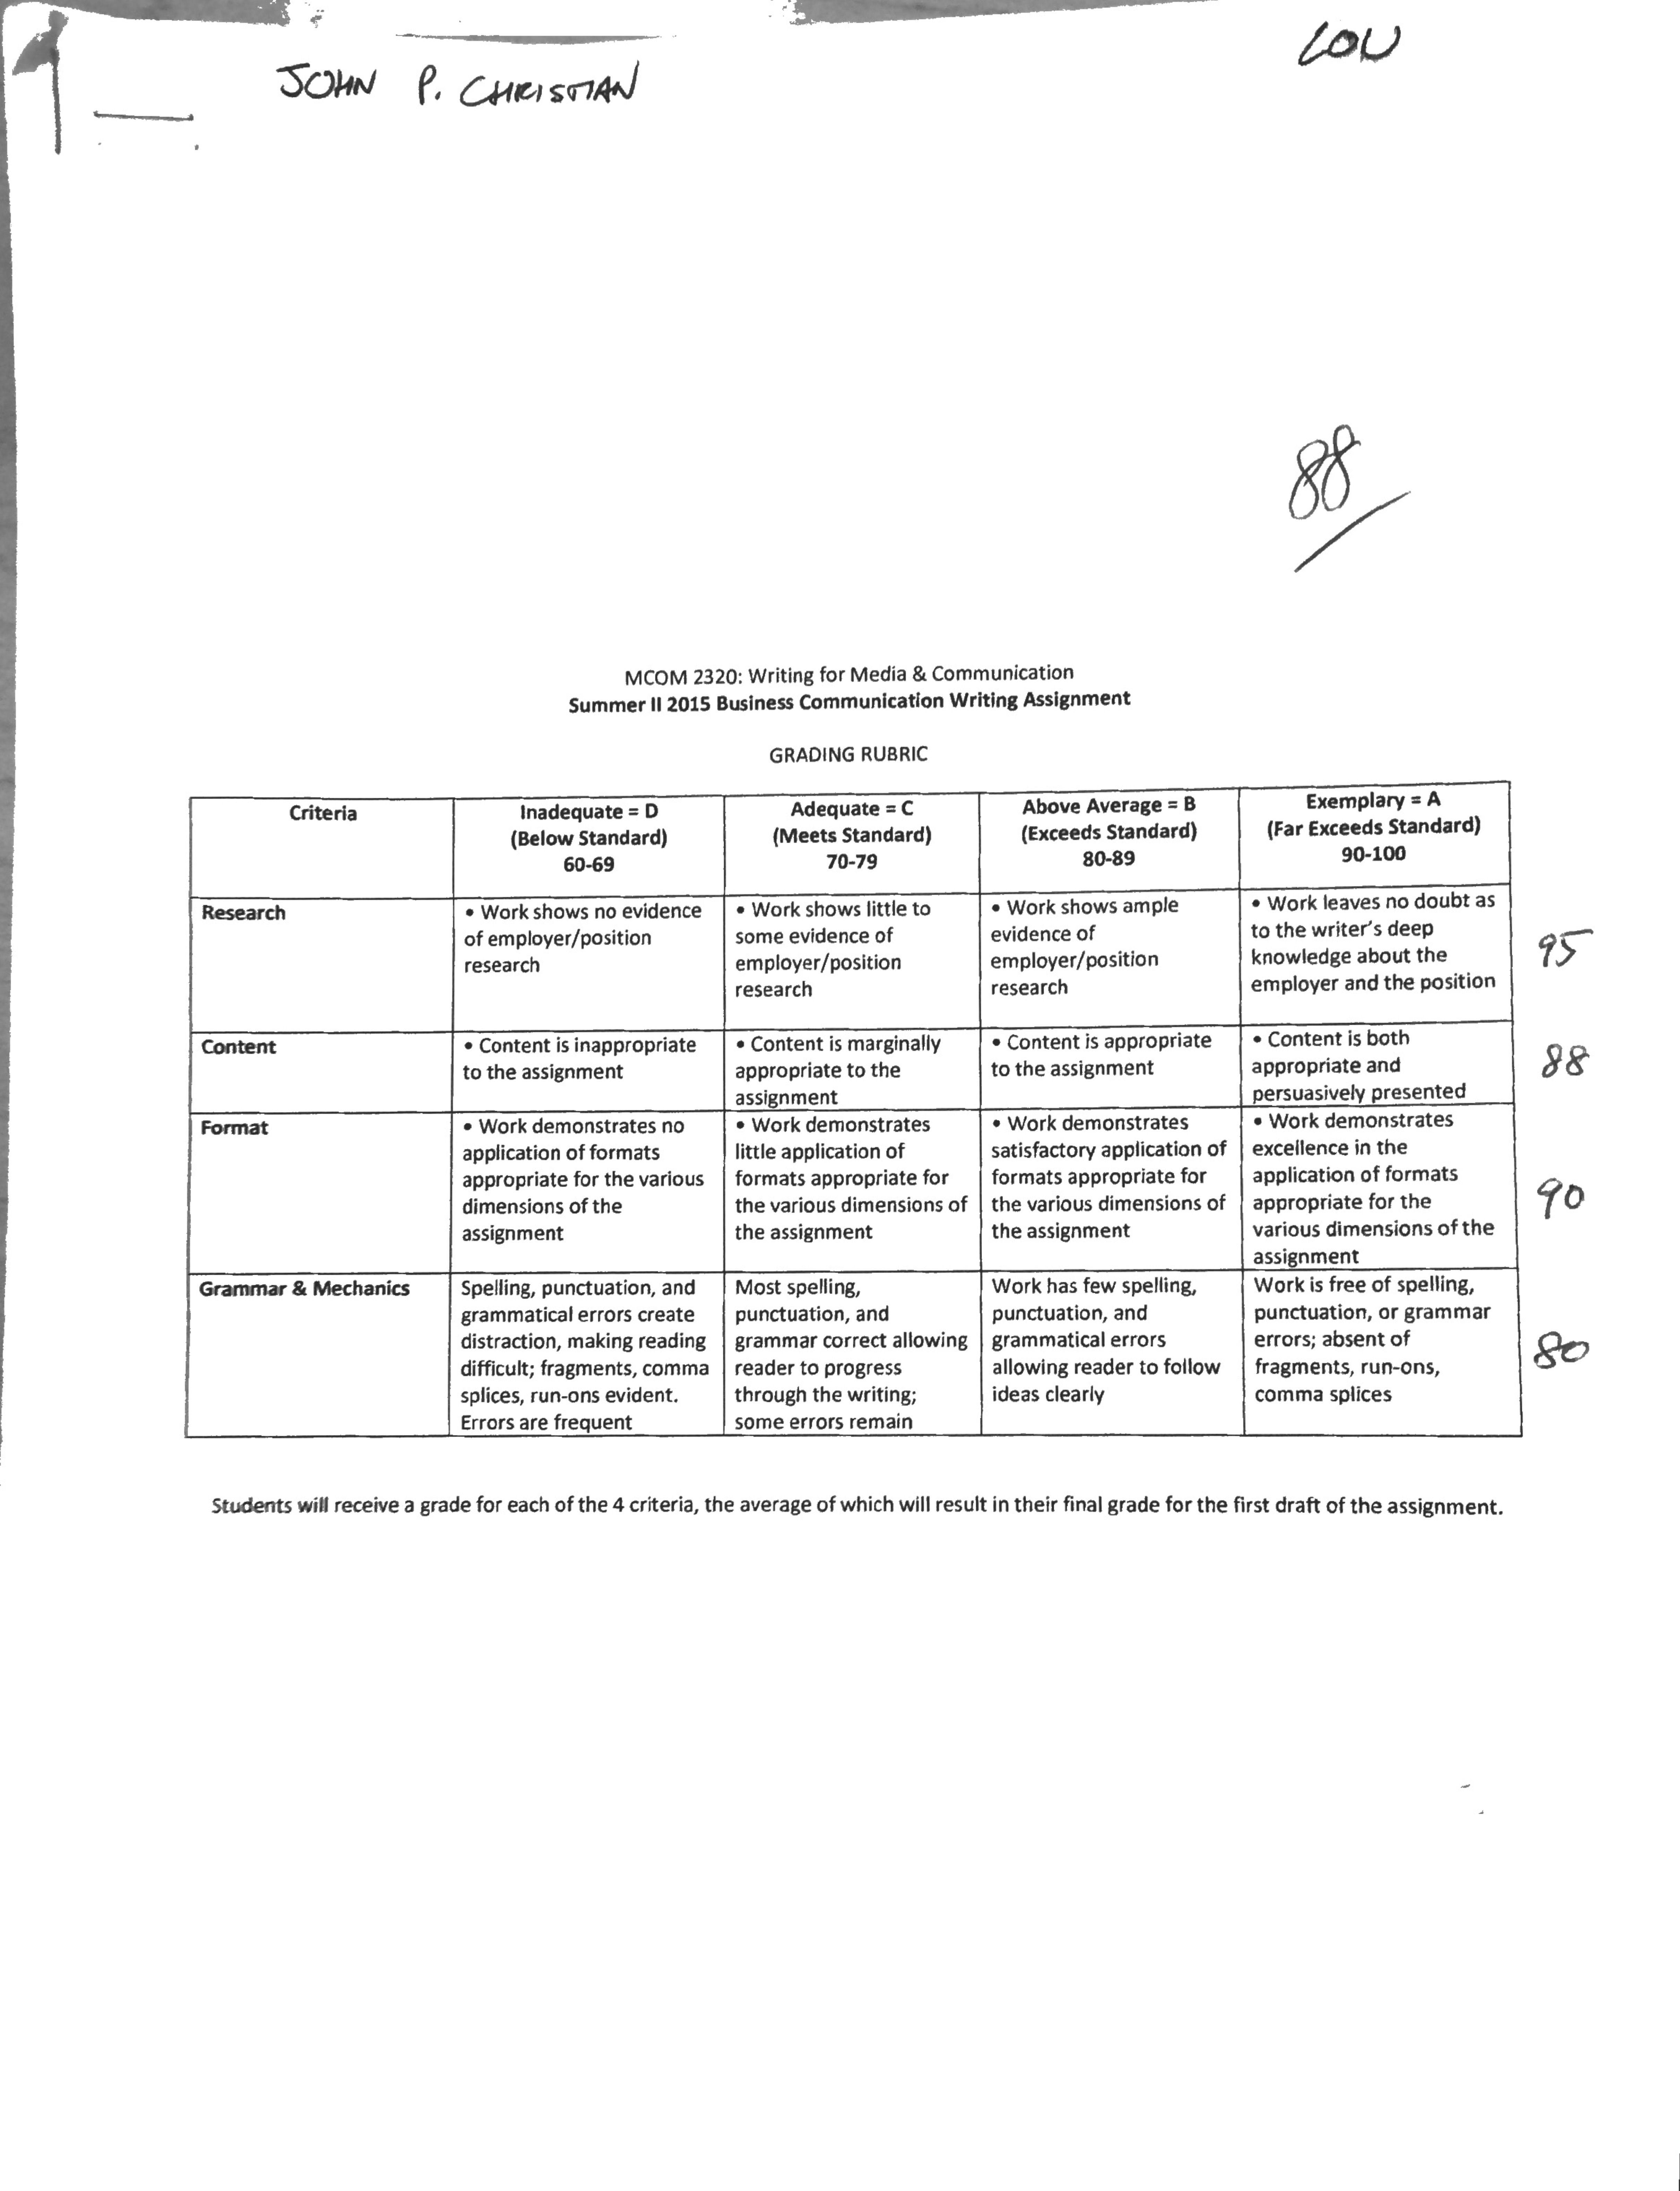 Cover Letter Rubric Essay Grading Doc Mock For Evaluation Resume